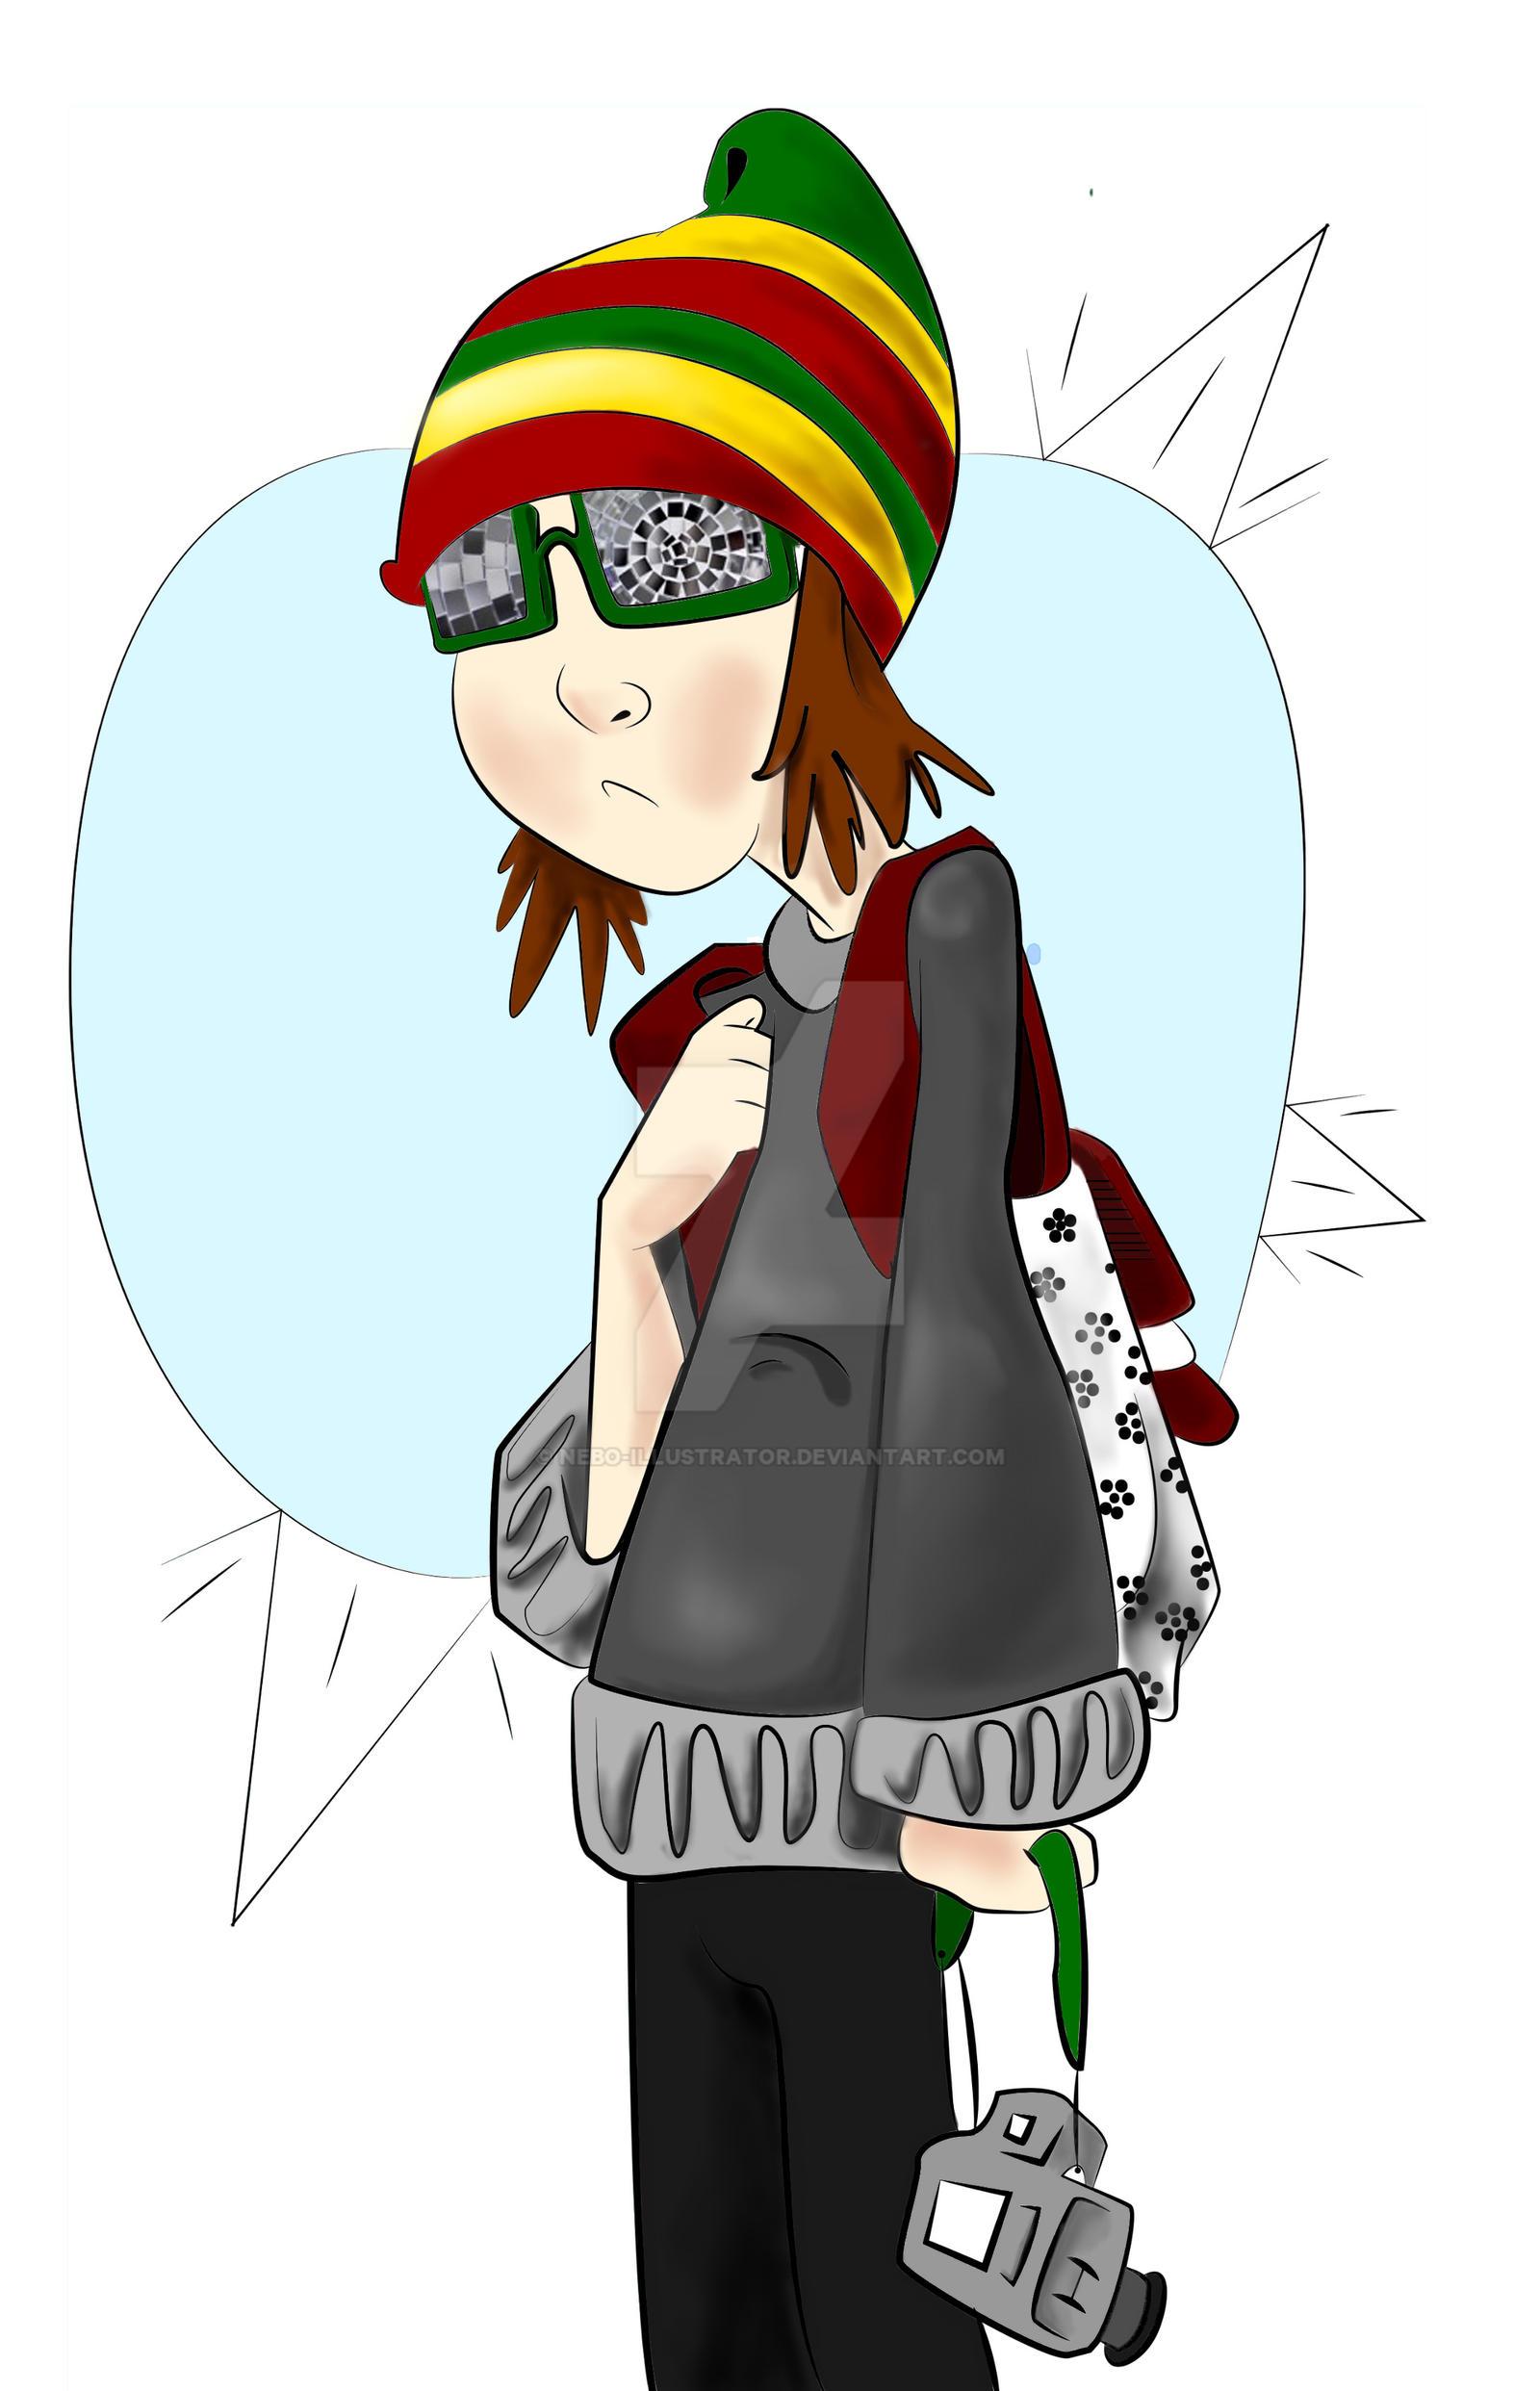 Character Design By Illustrator : Loner character design by nebo illustrator on deviantart